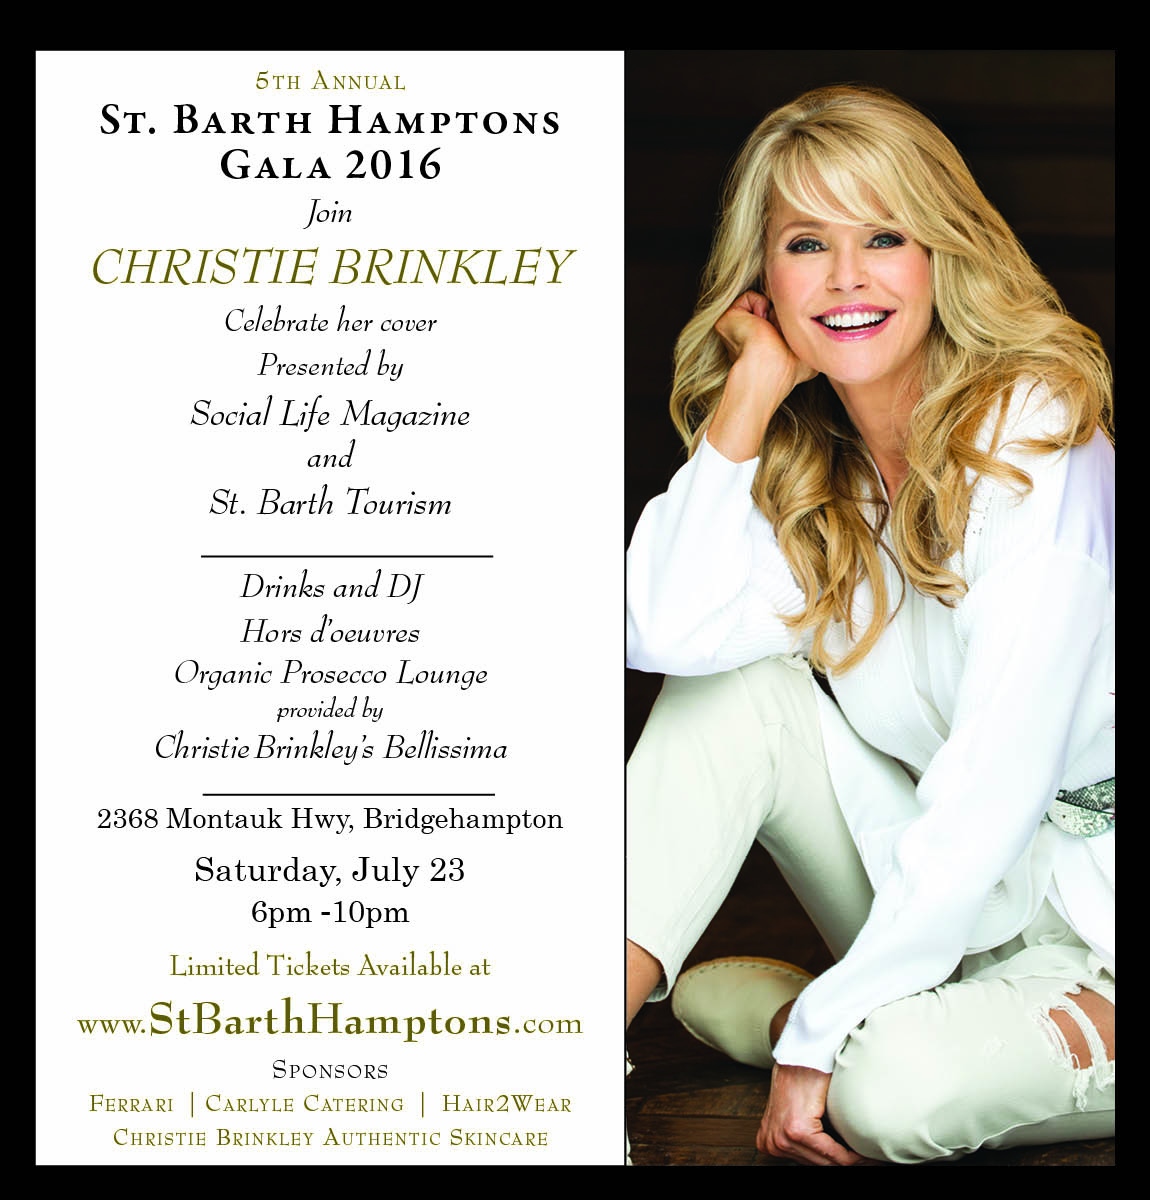 5th Annual St. Barth Hamptons Gala